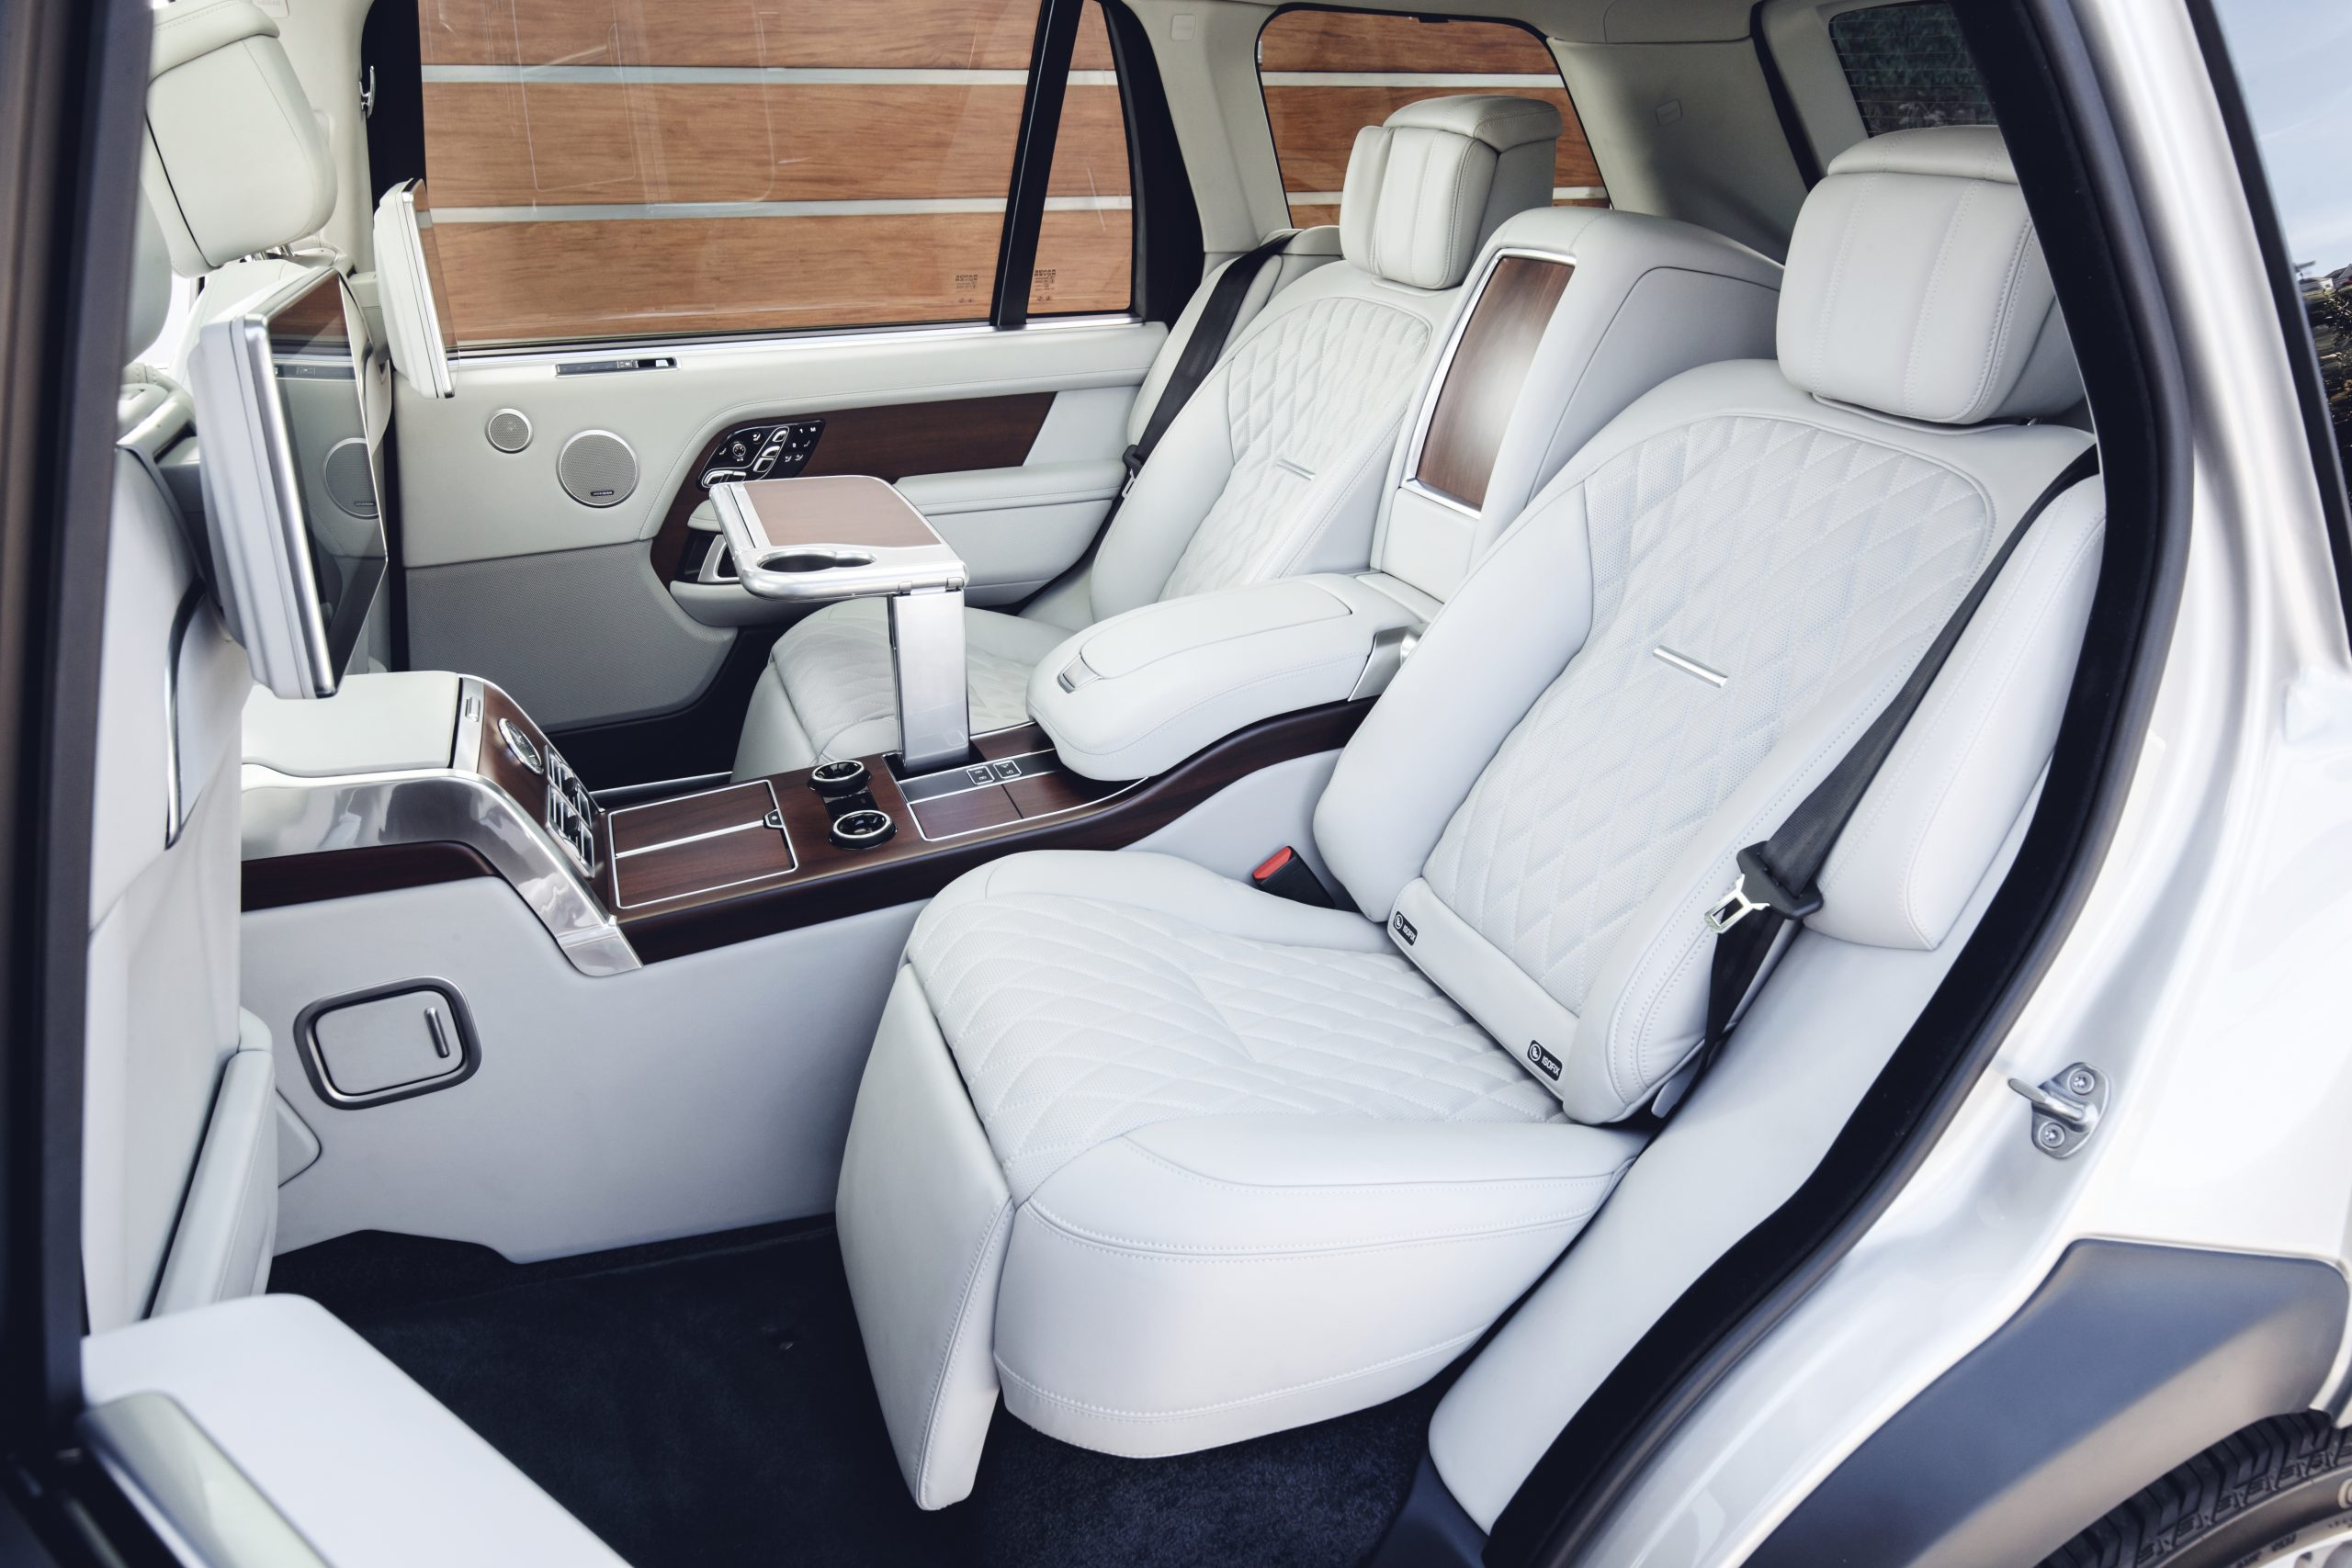 Land Rover Range Rover SVAutobiography interior